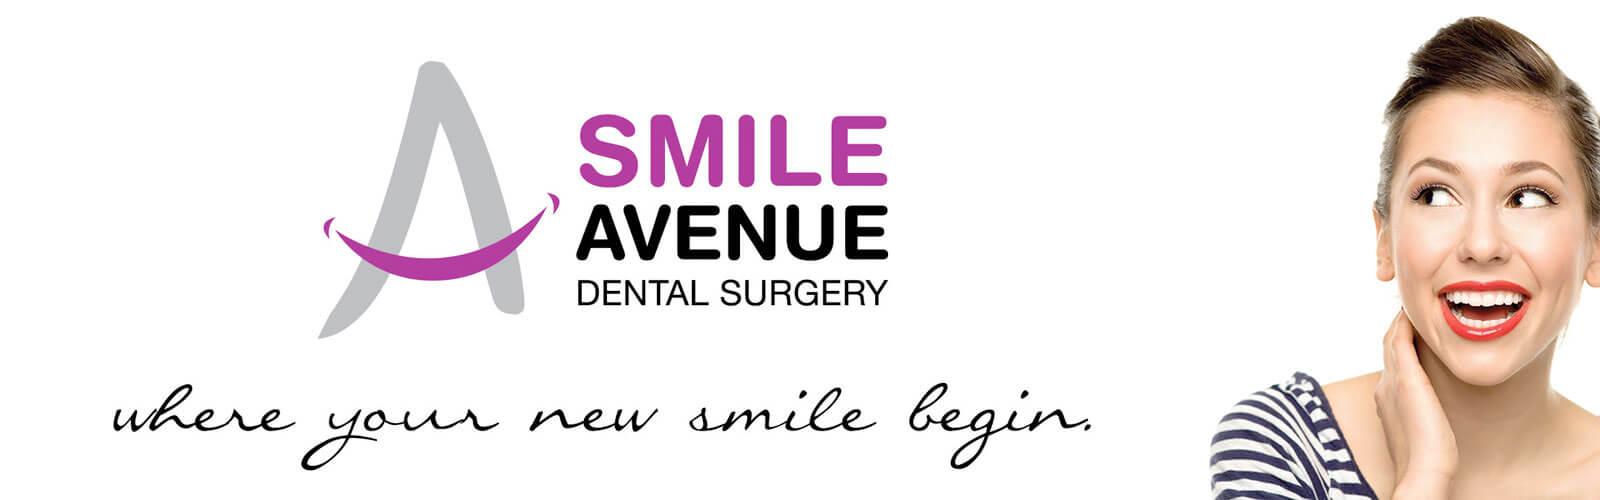 Smile Avenue Dental Surgery Dental Clinic - MYDOC.my